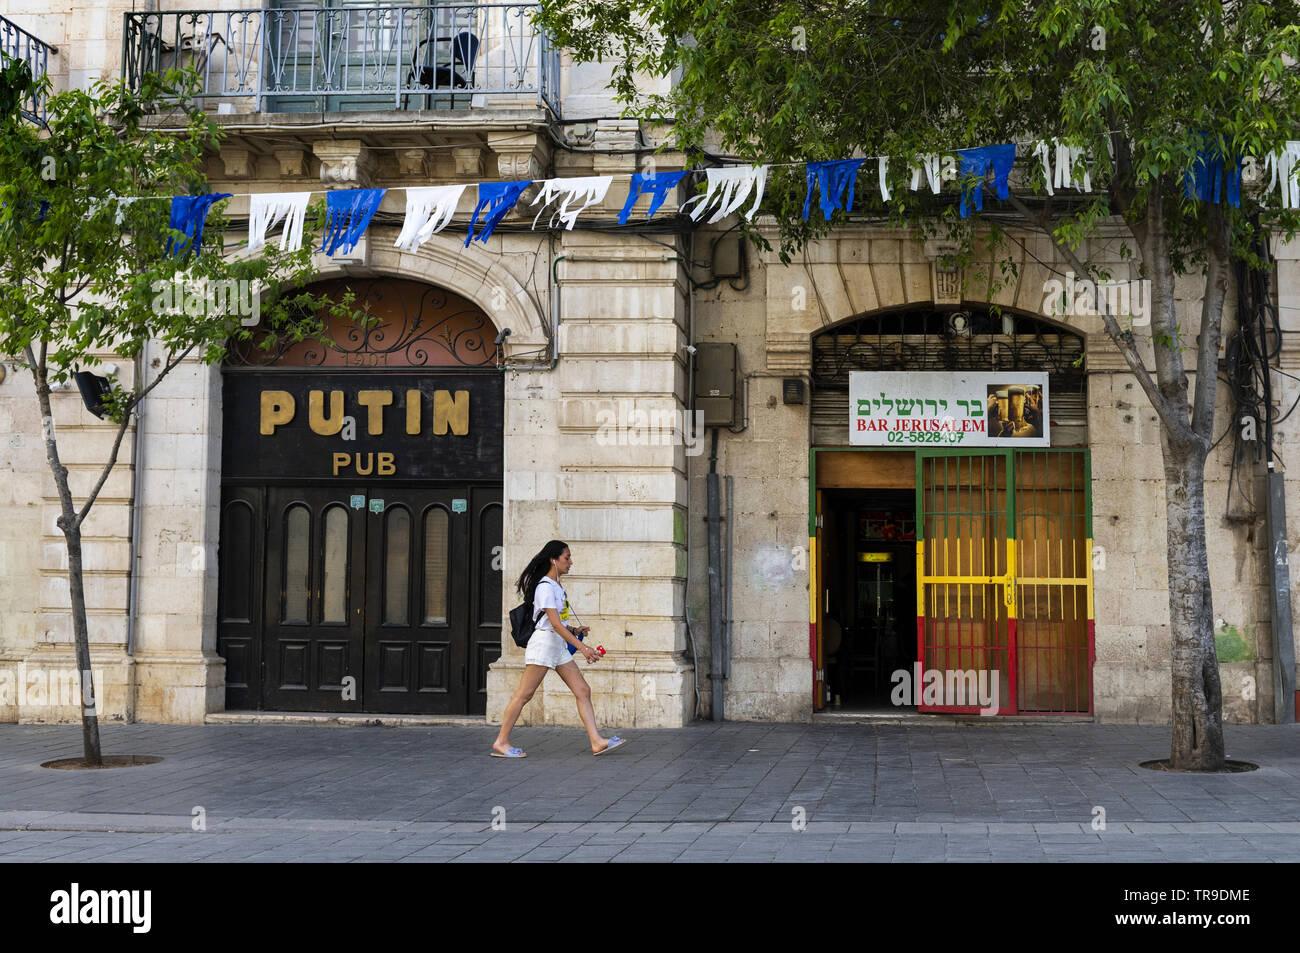 Pub bearing the name of the Russian President Vladimir Putin in Jerusalem - Stock Image